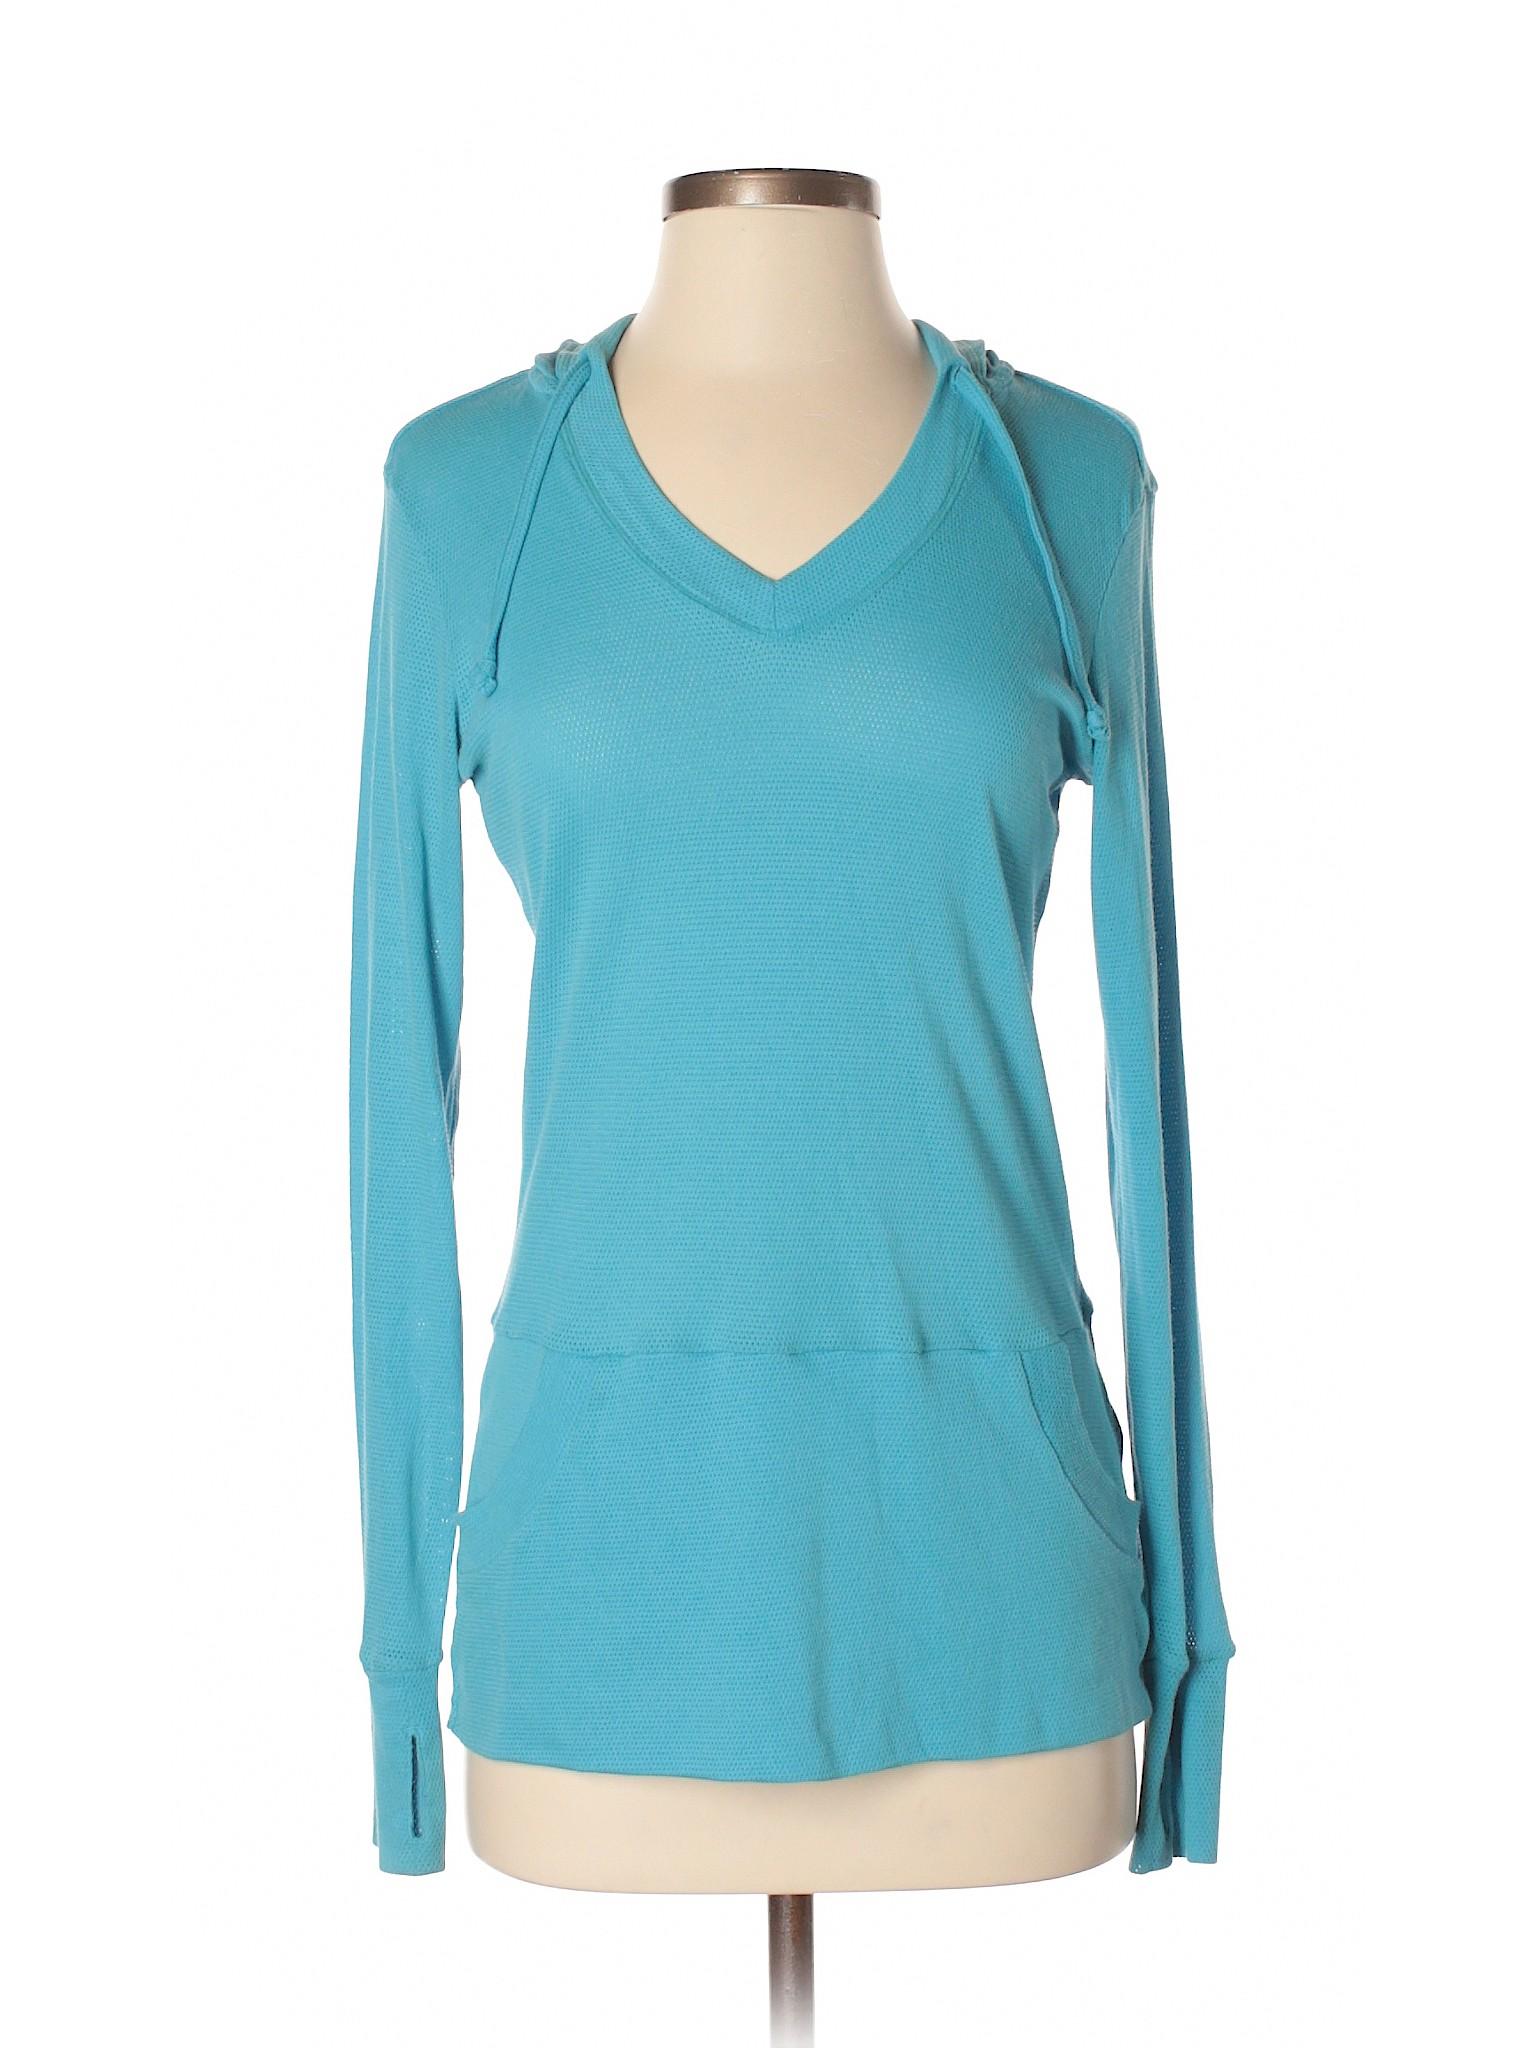 Boutique ExOfficio Boutique Sweater Pullover winter winter rxFZ1qwYr